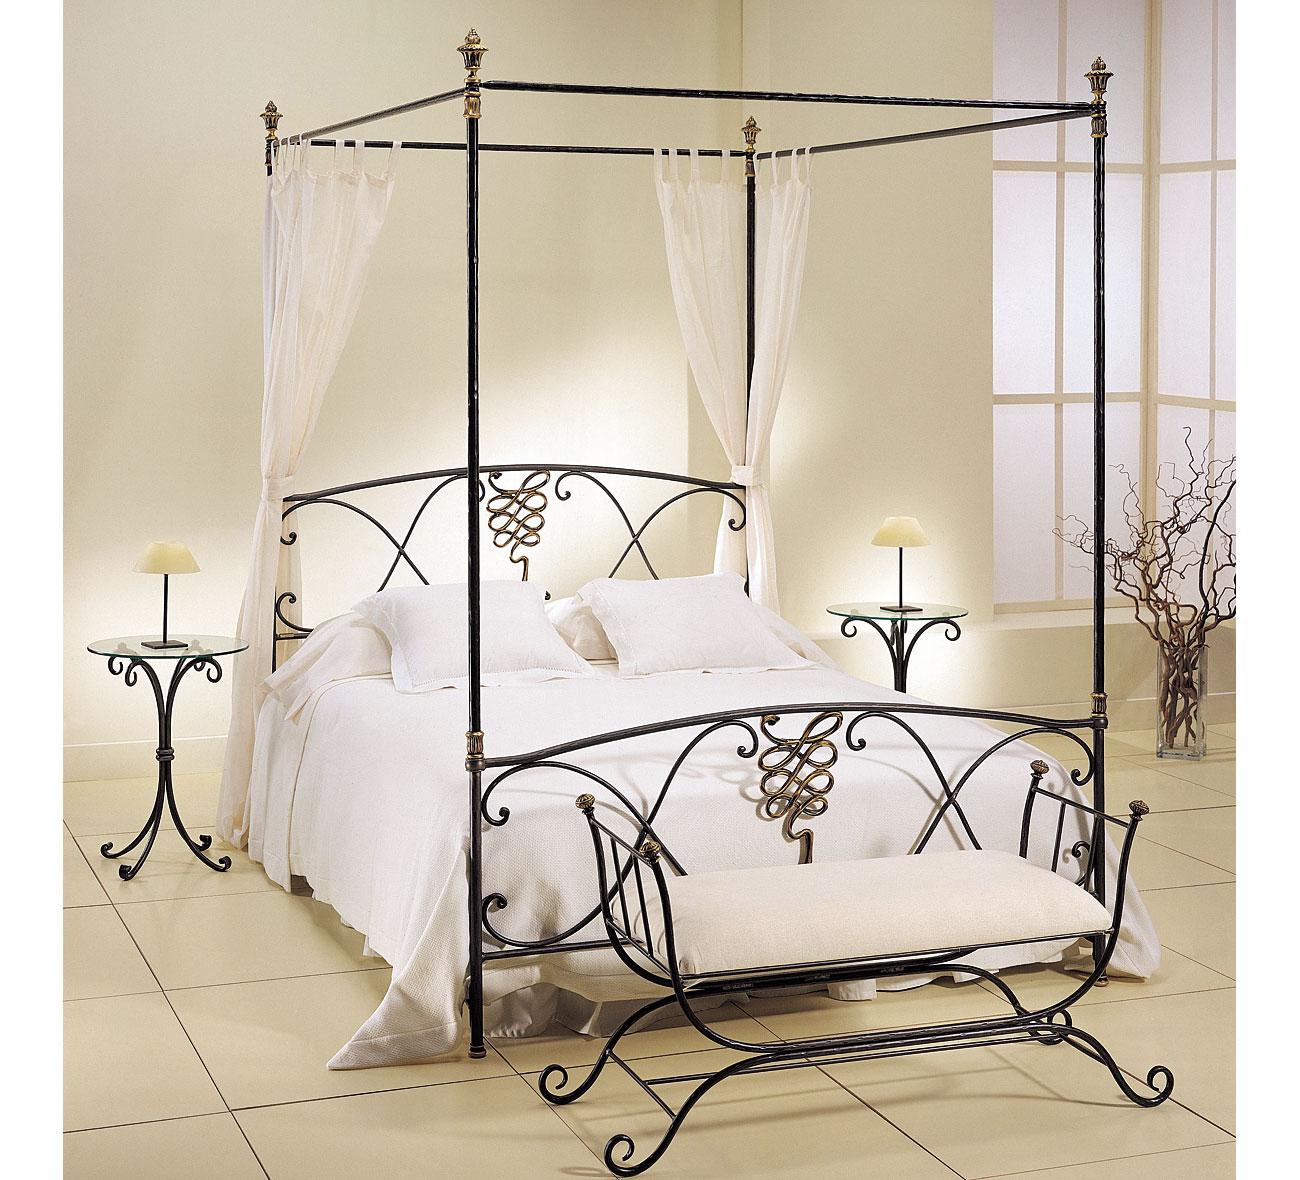 Dormitorio forja berruguete en - Muebles en forja ...